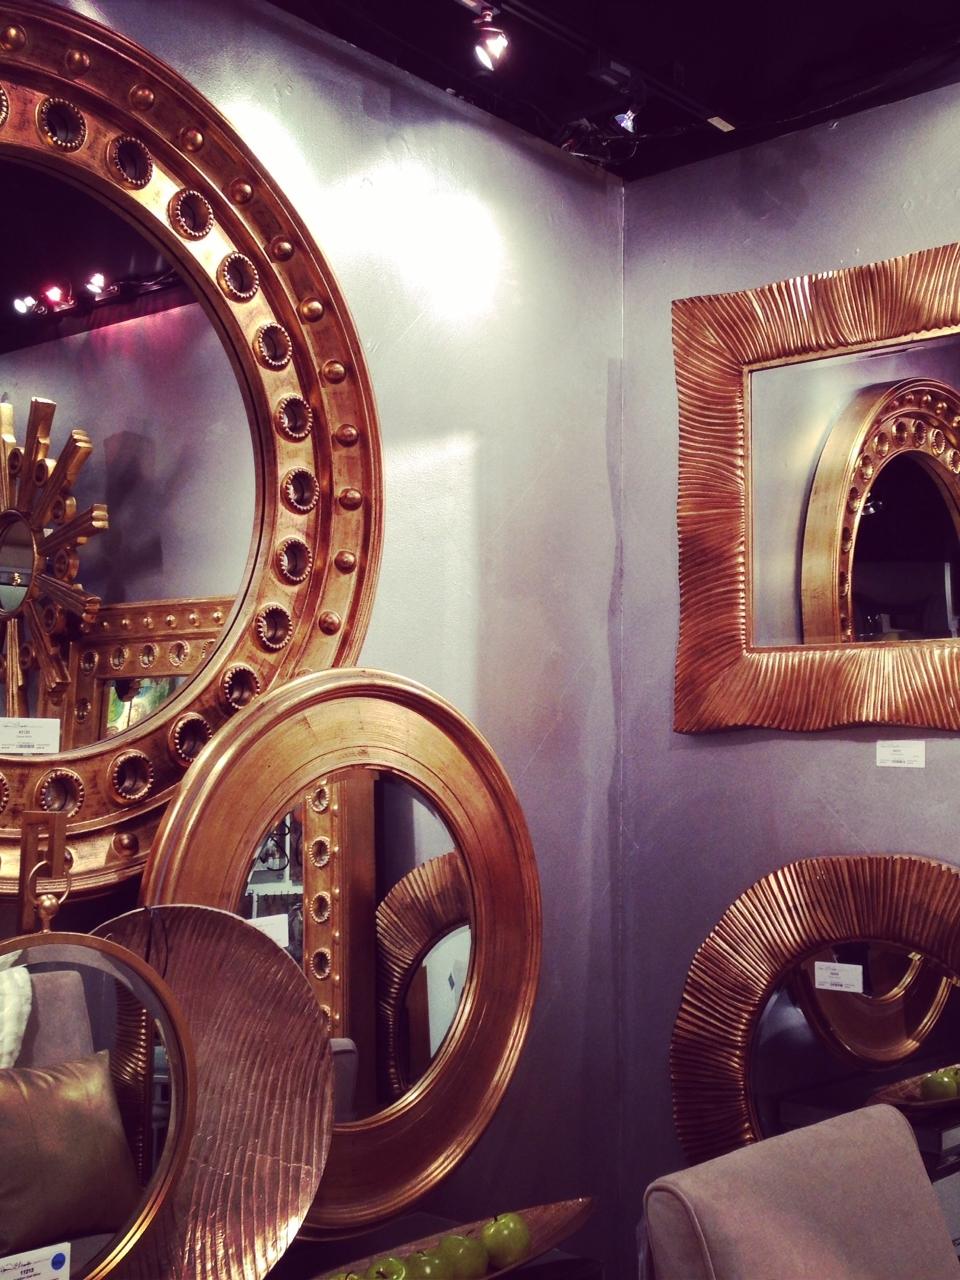 5 Trends Discovered At Las Vegas Market 39 S Home Furnishings Decor Exhibit Designed W Carla Aston